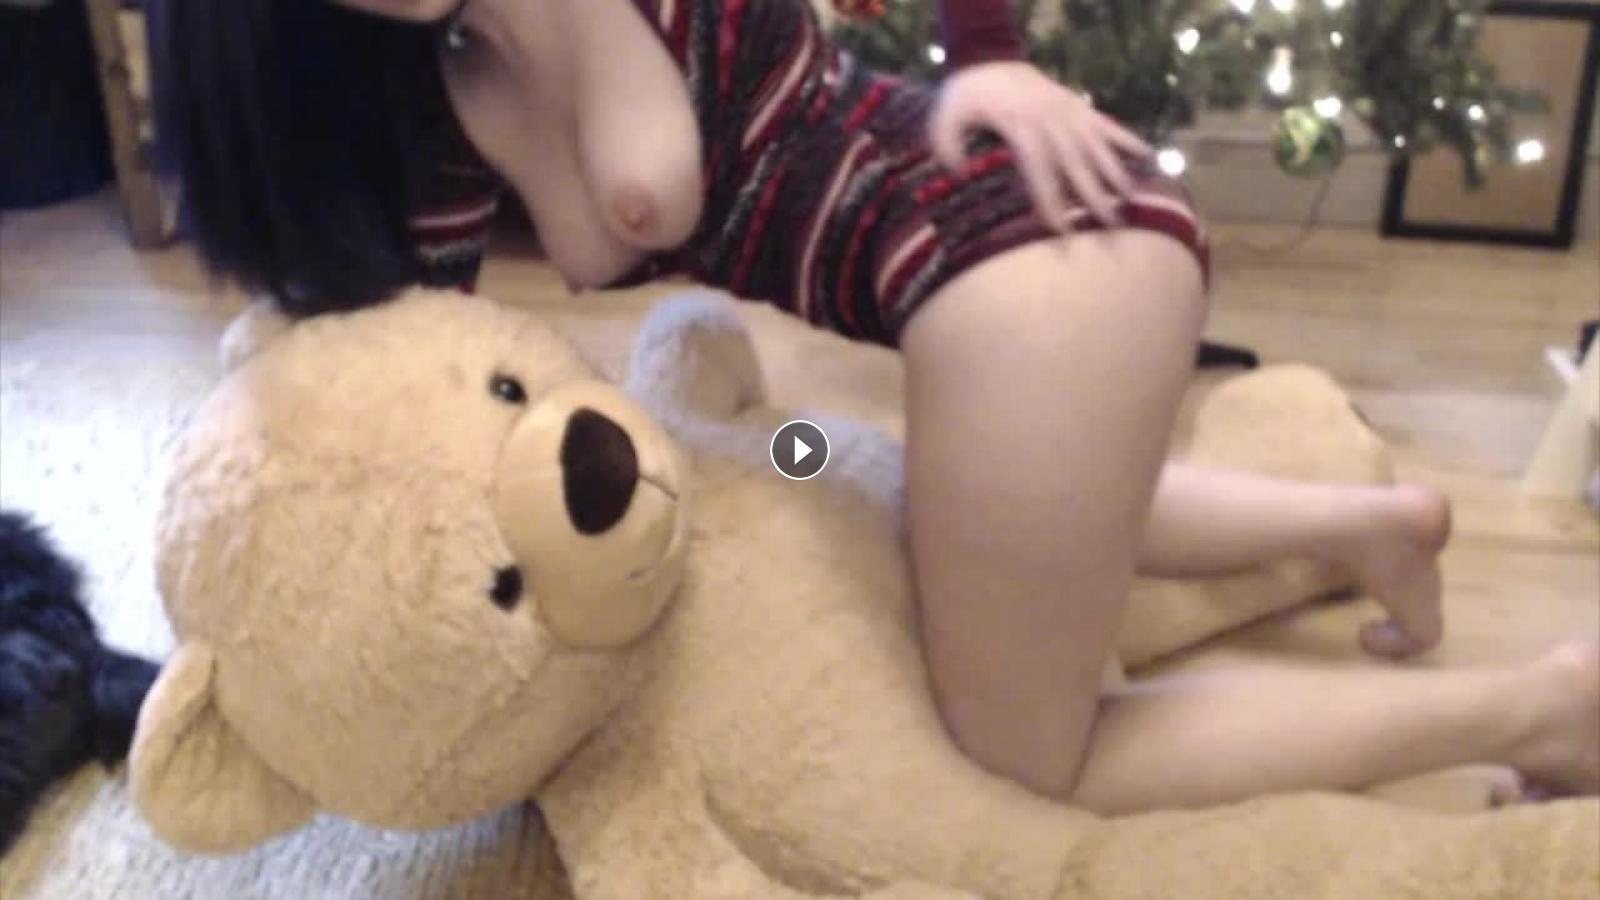 Naked teens teddy bear humping ass licking